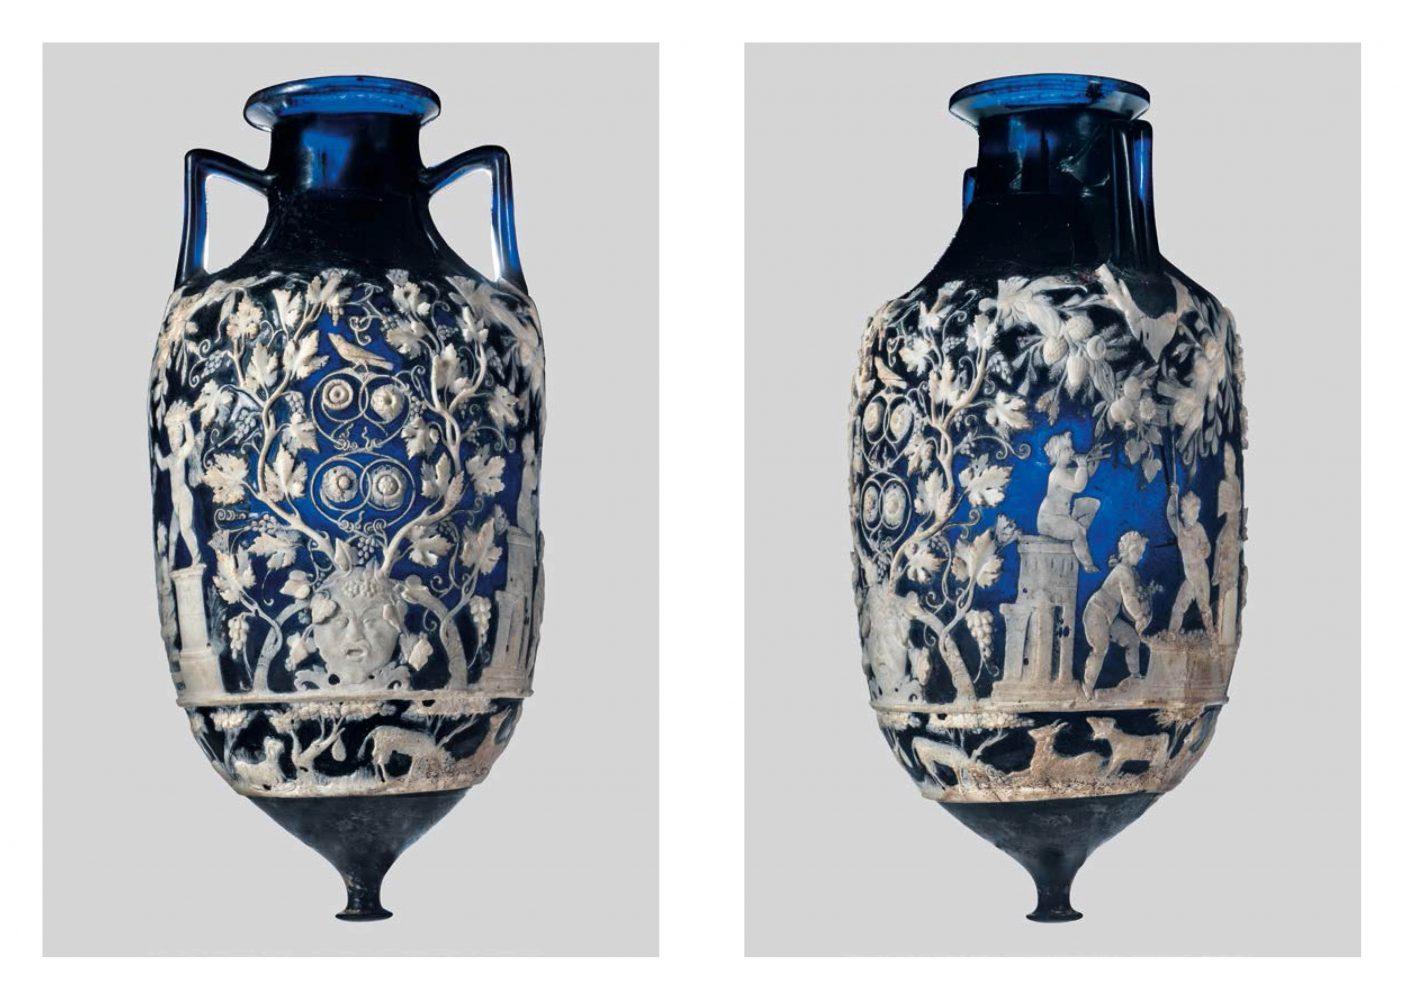 Memorie del vaso blu 5 continents editions for Vaso blu